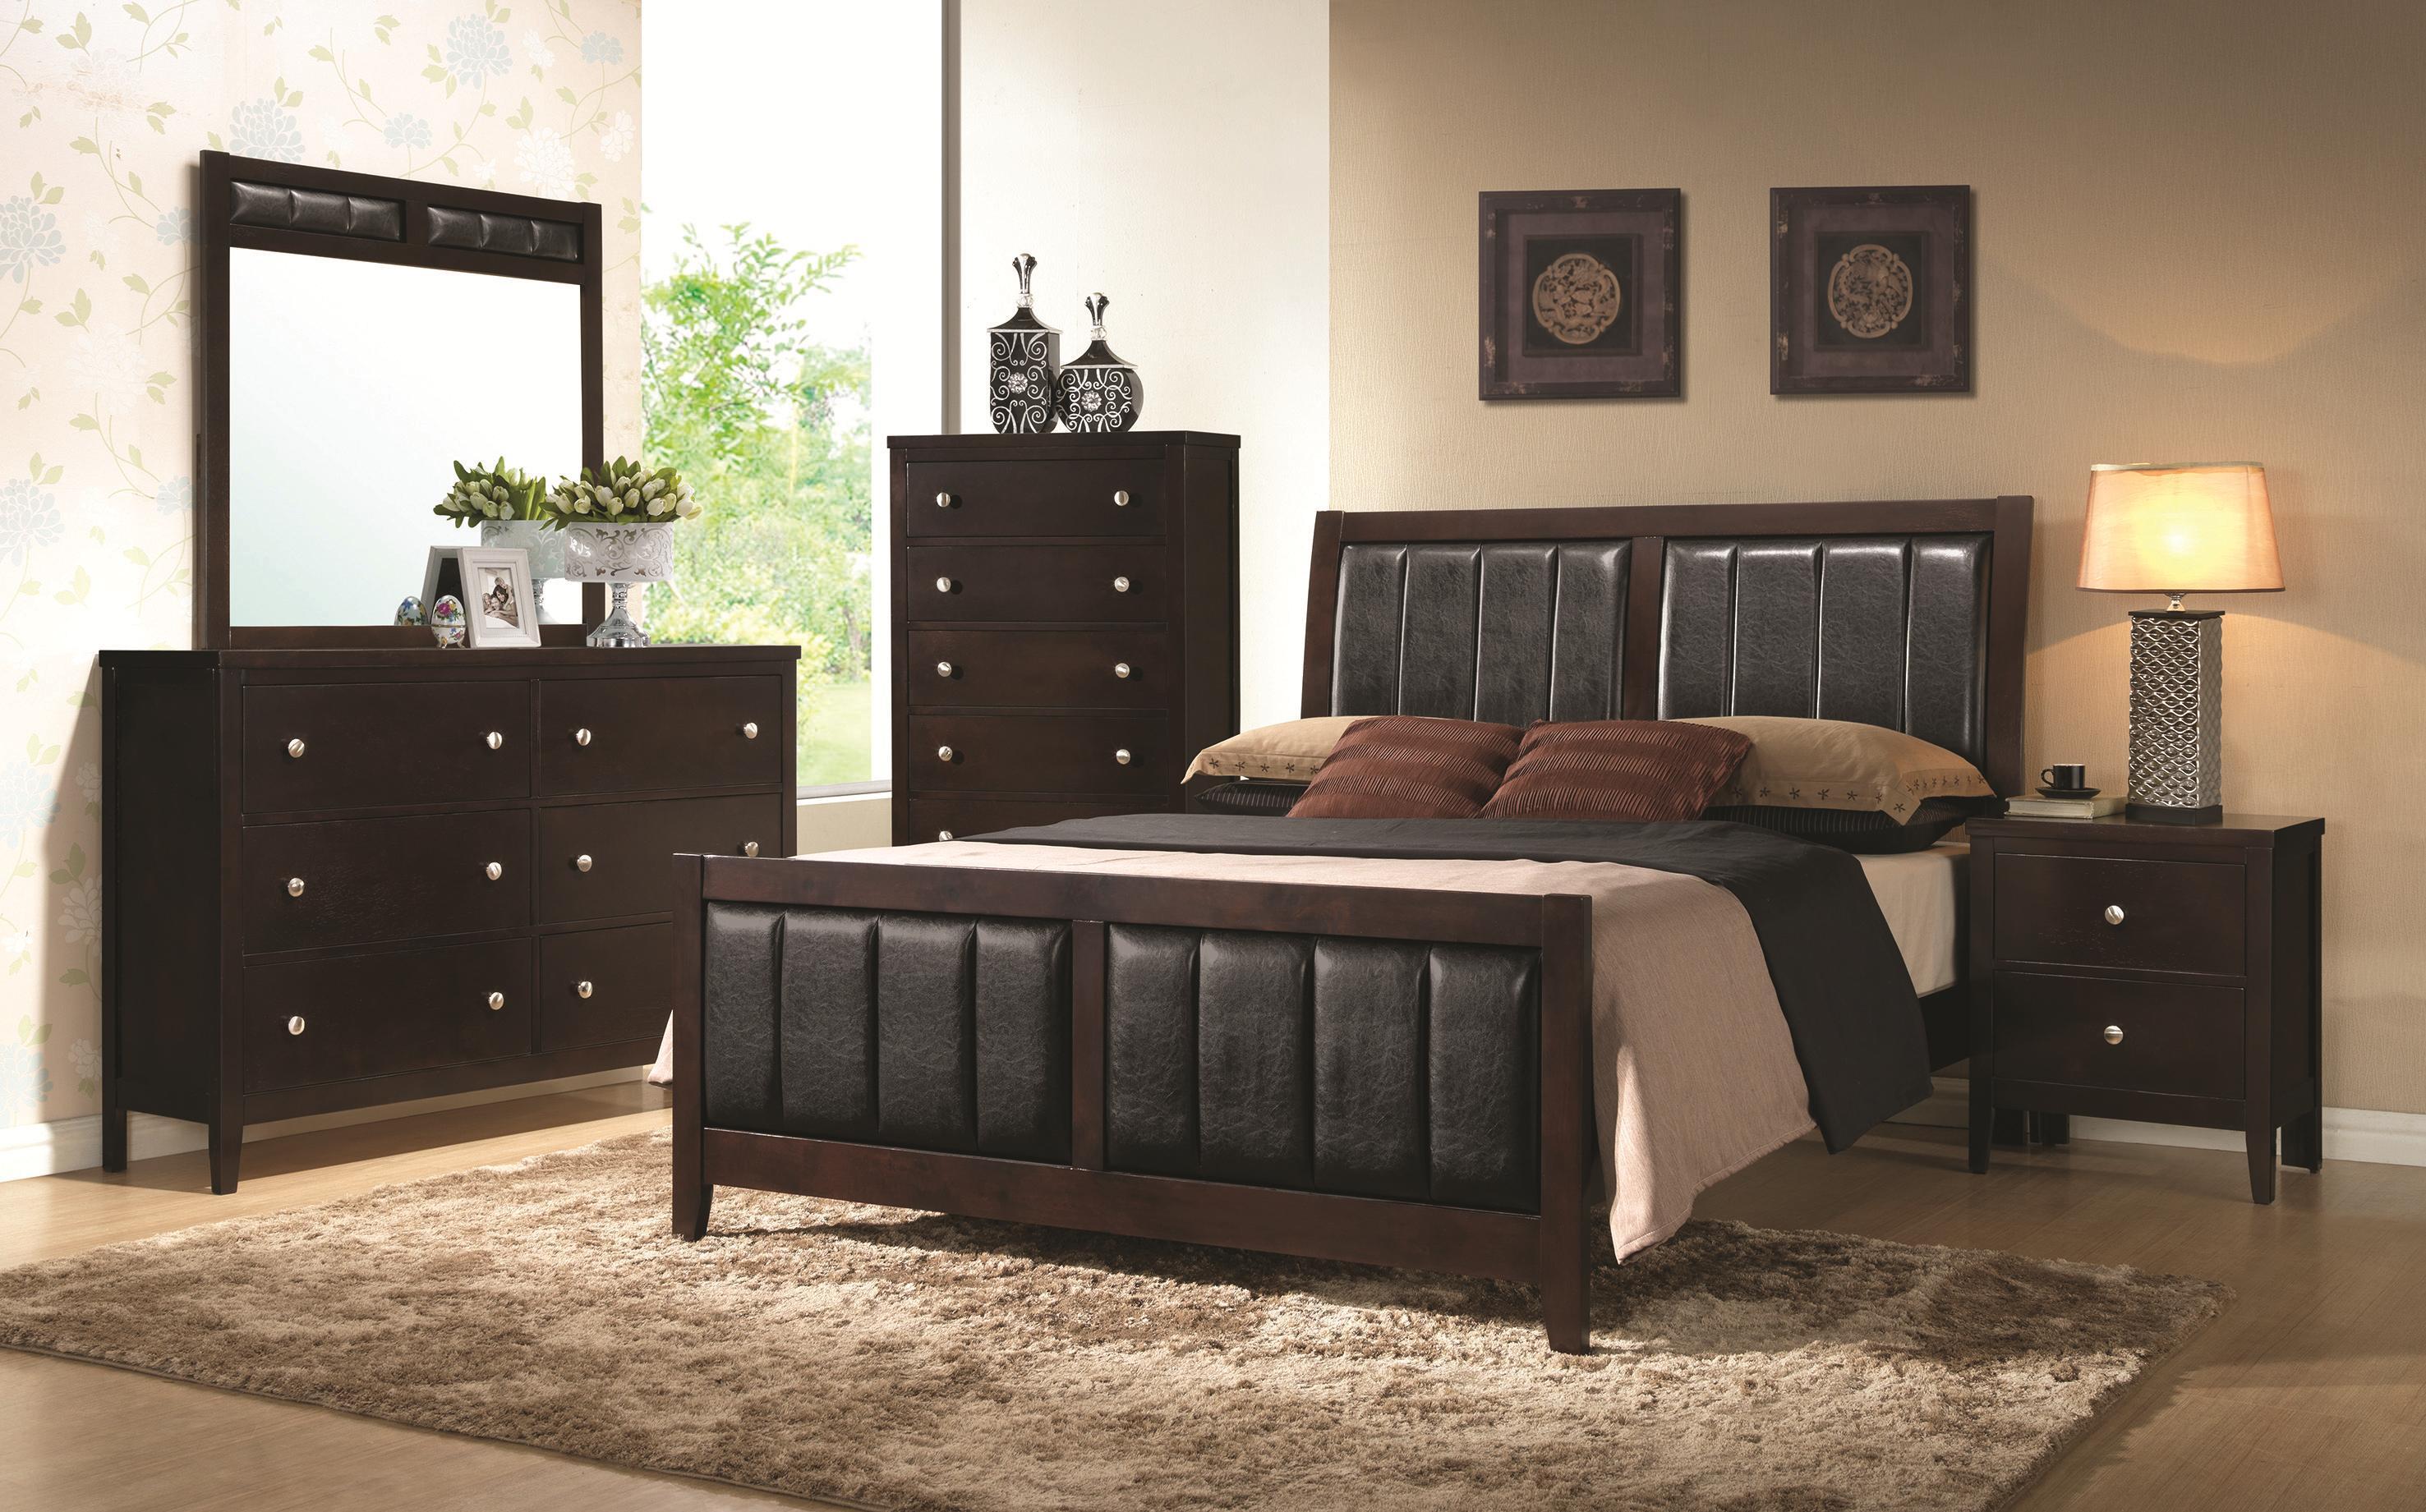 Coaster Carlton Queen Bedroom Group - Item Number: 20209 Q Bedroom Group